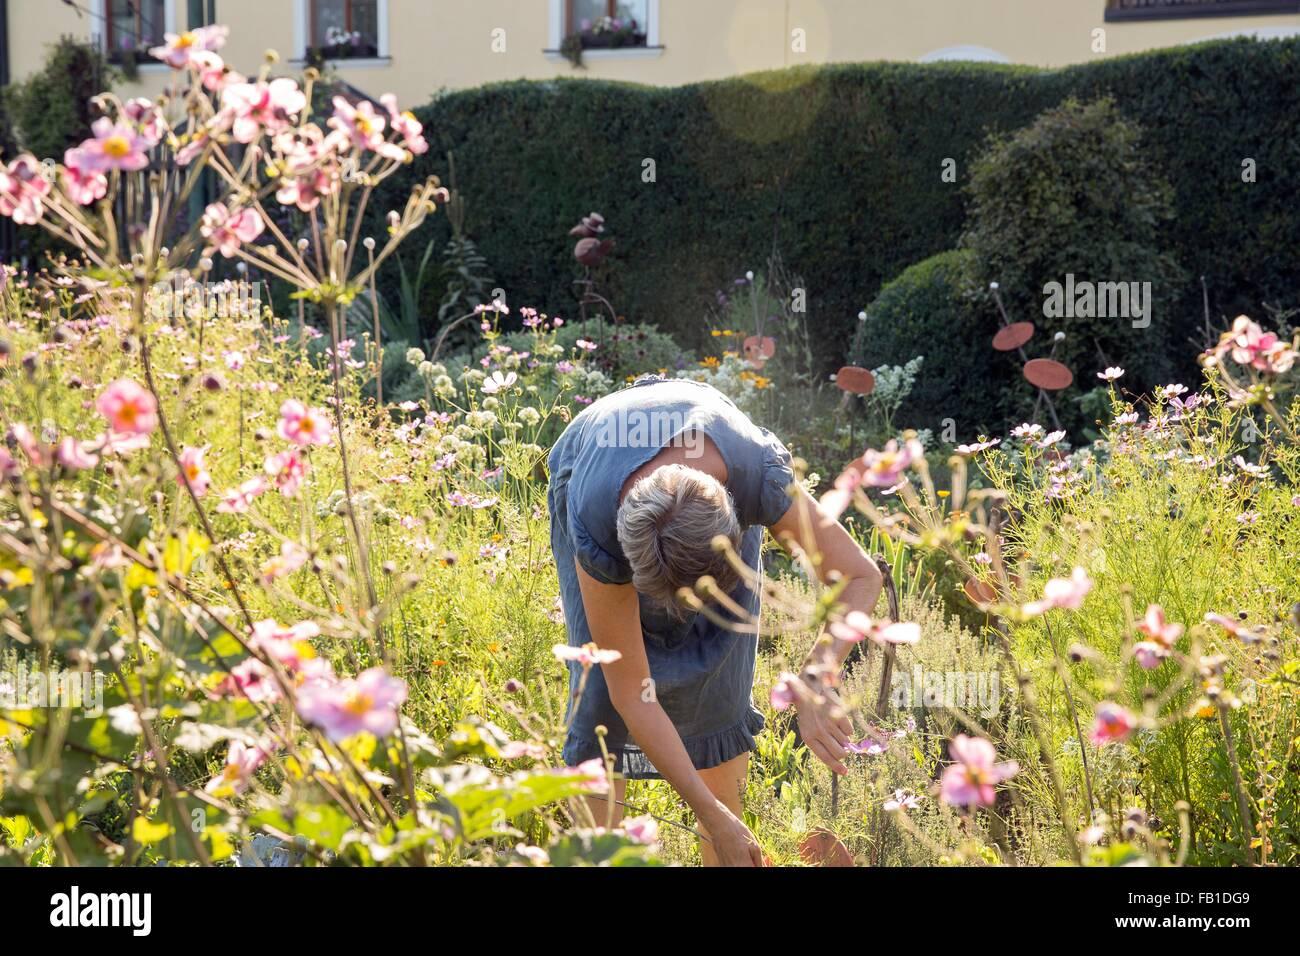 Mature woman gardening, bending over - Stock Image